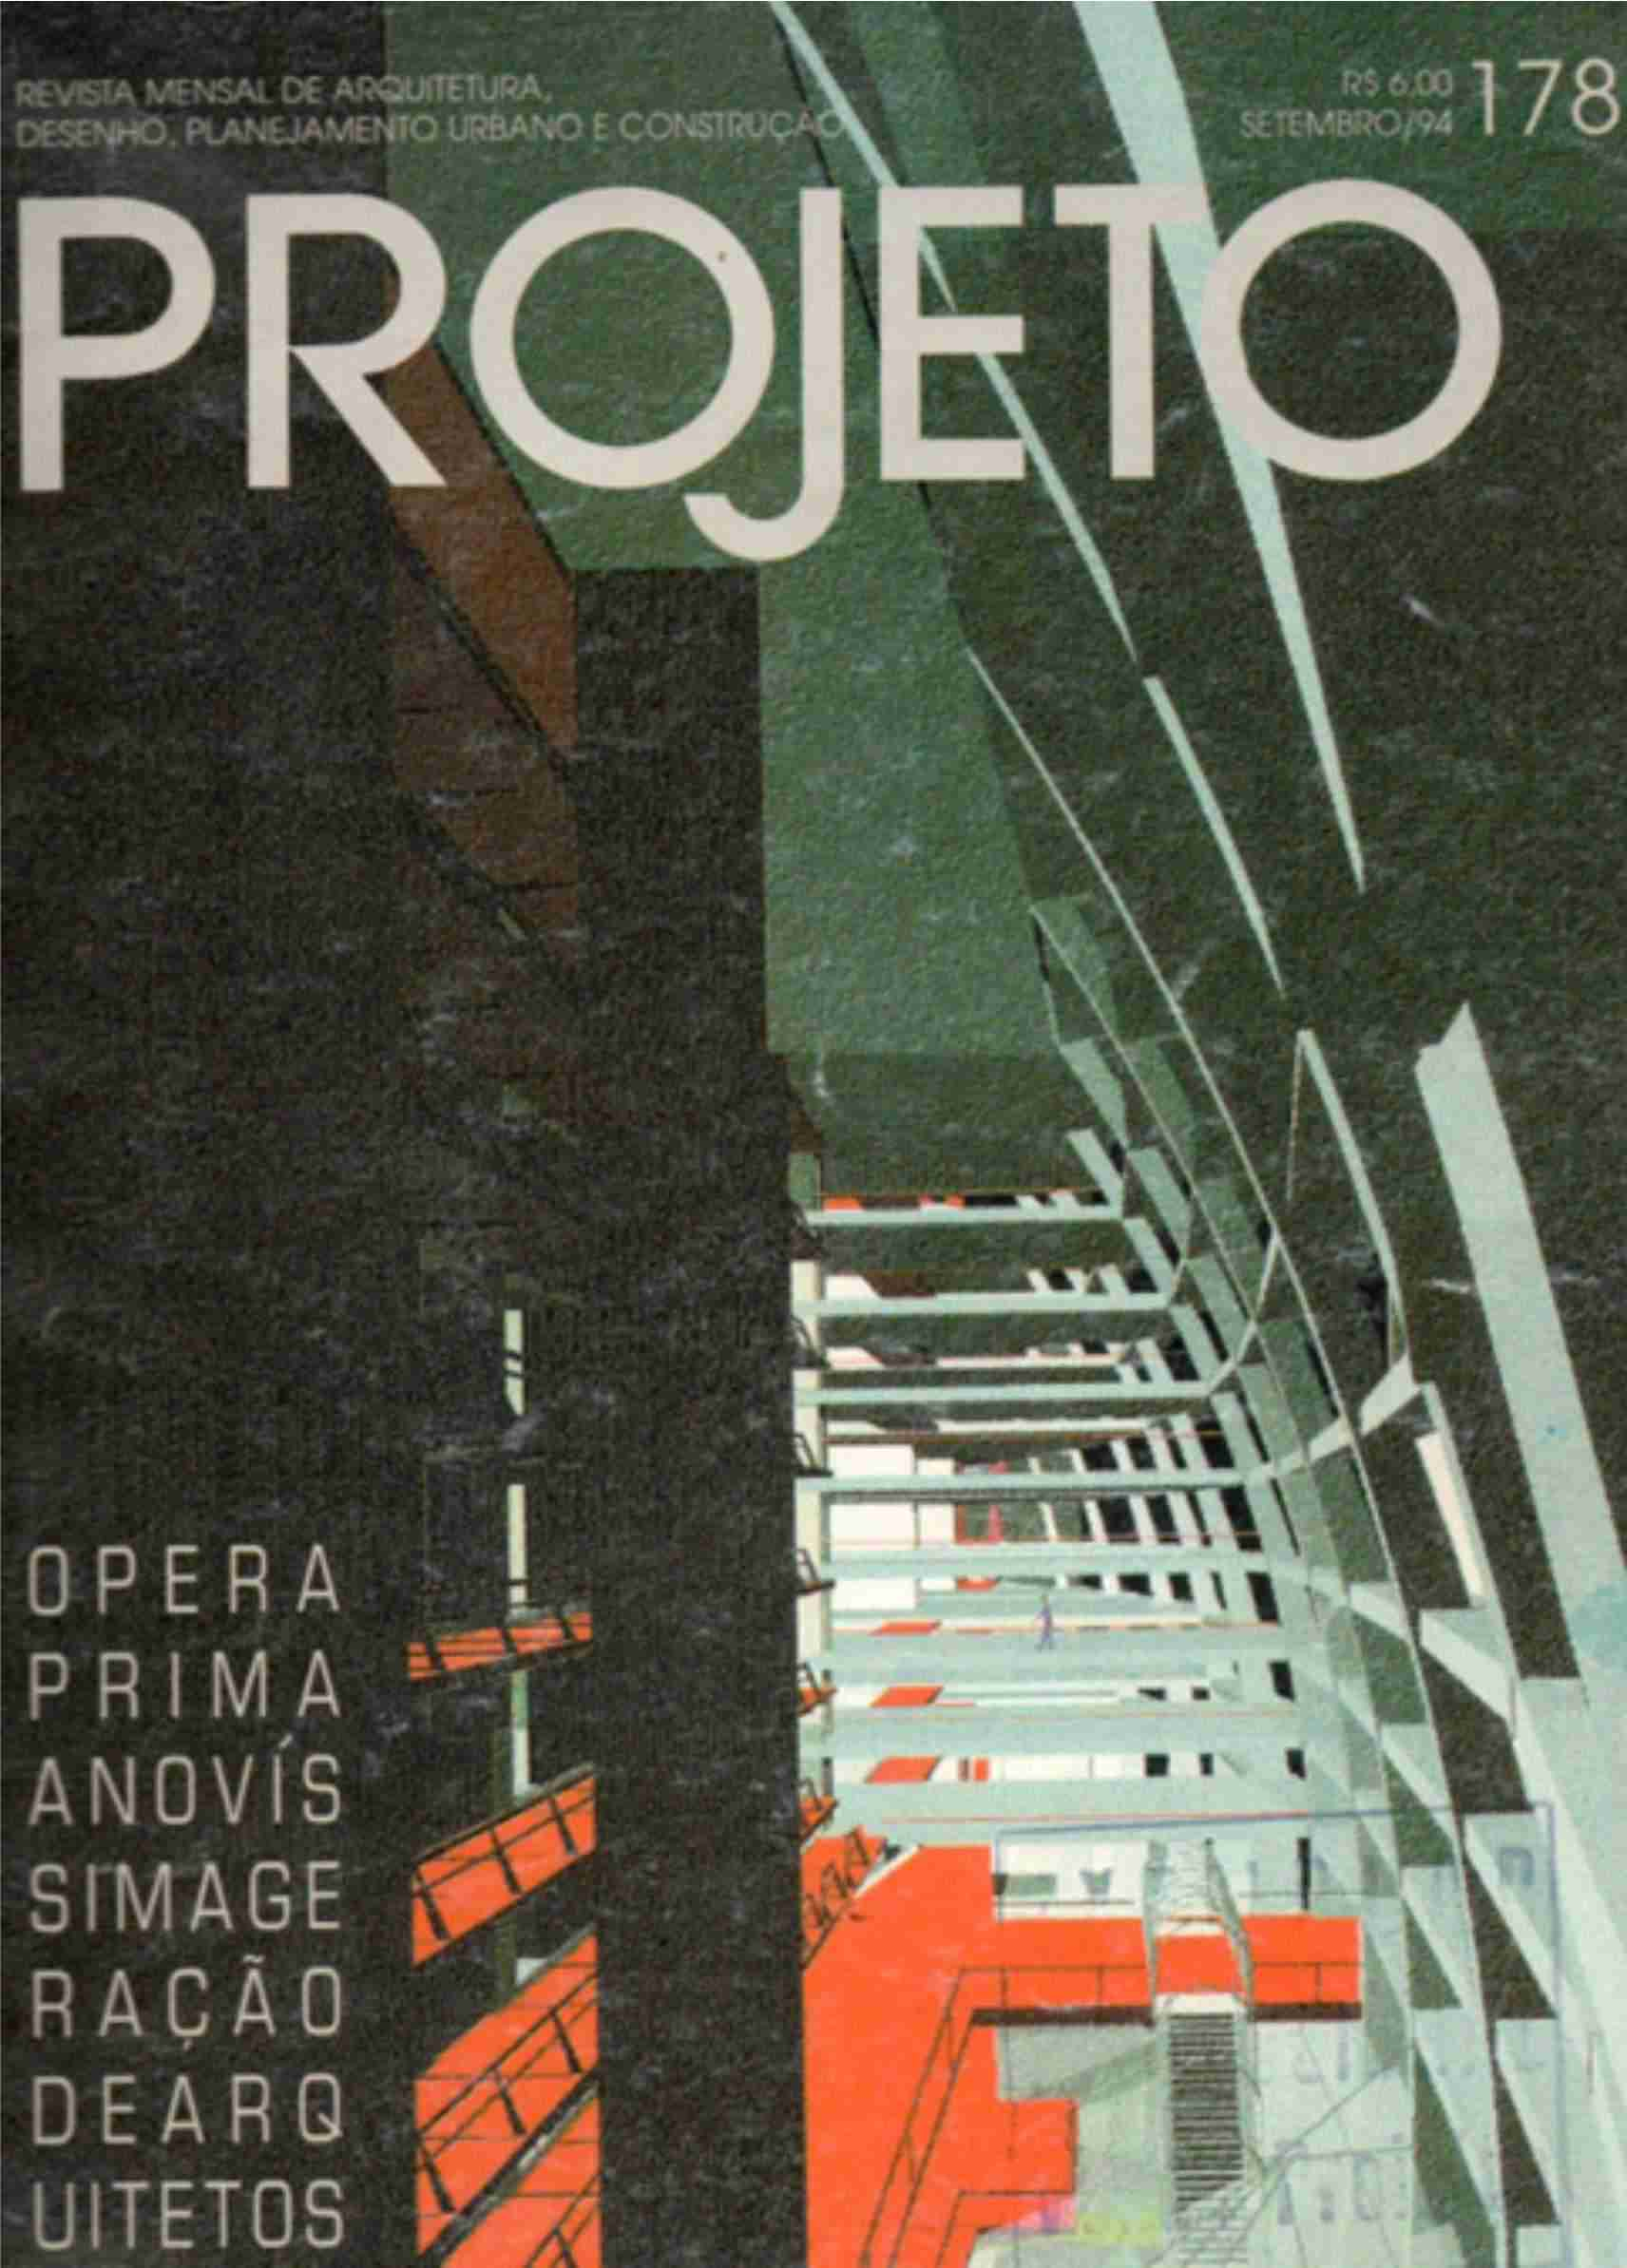 revista projeto-mmeb arquitetos